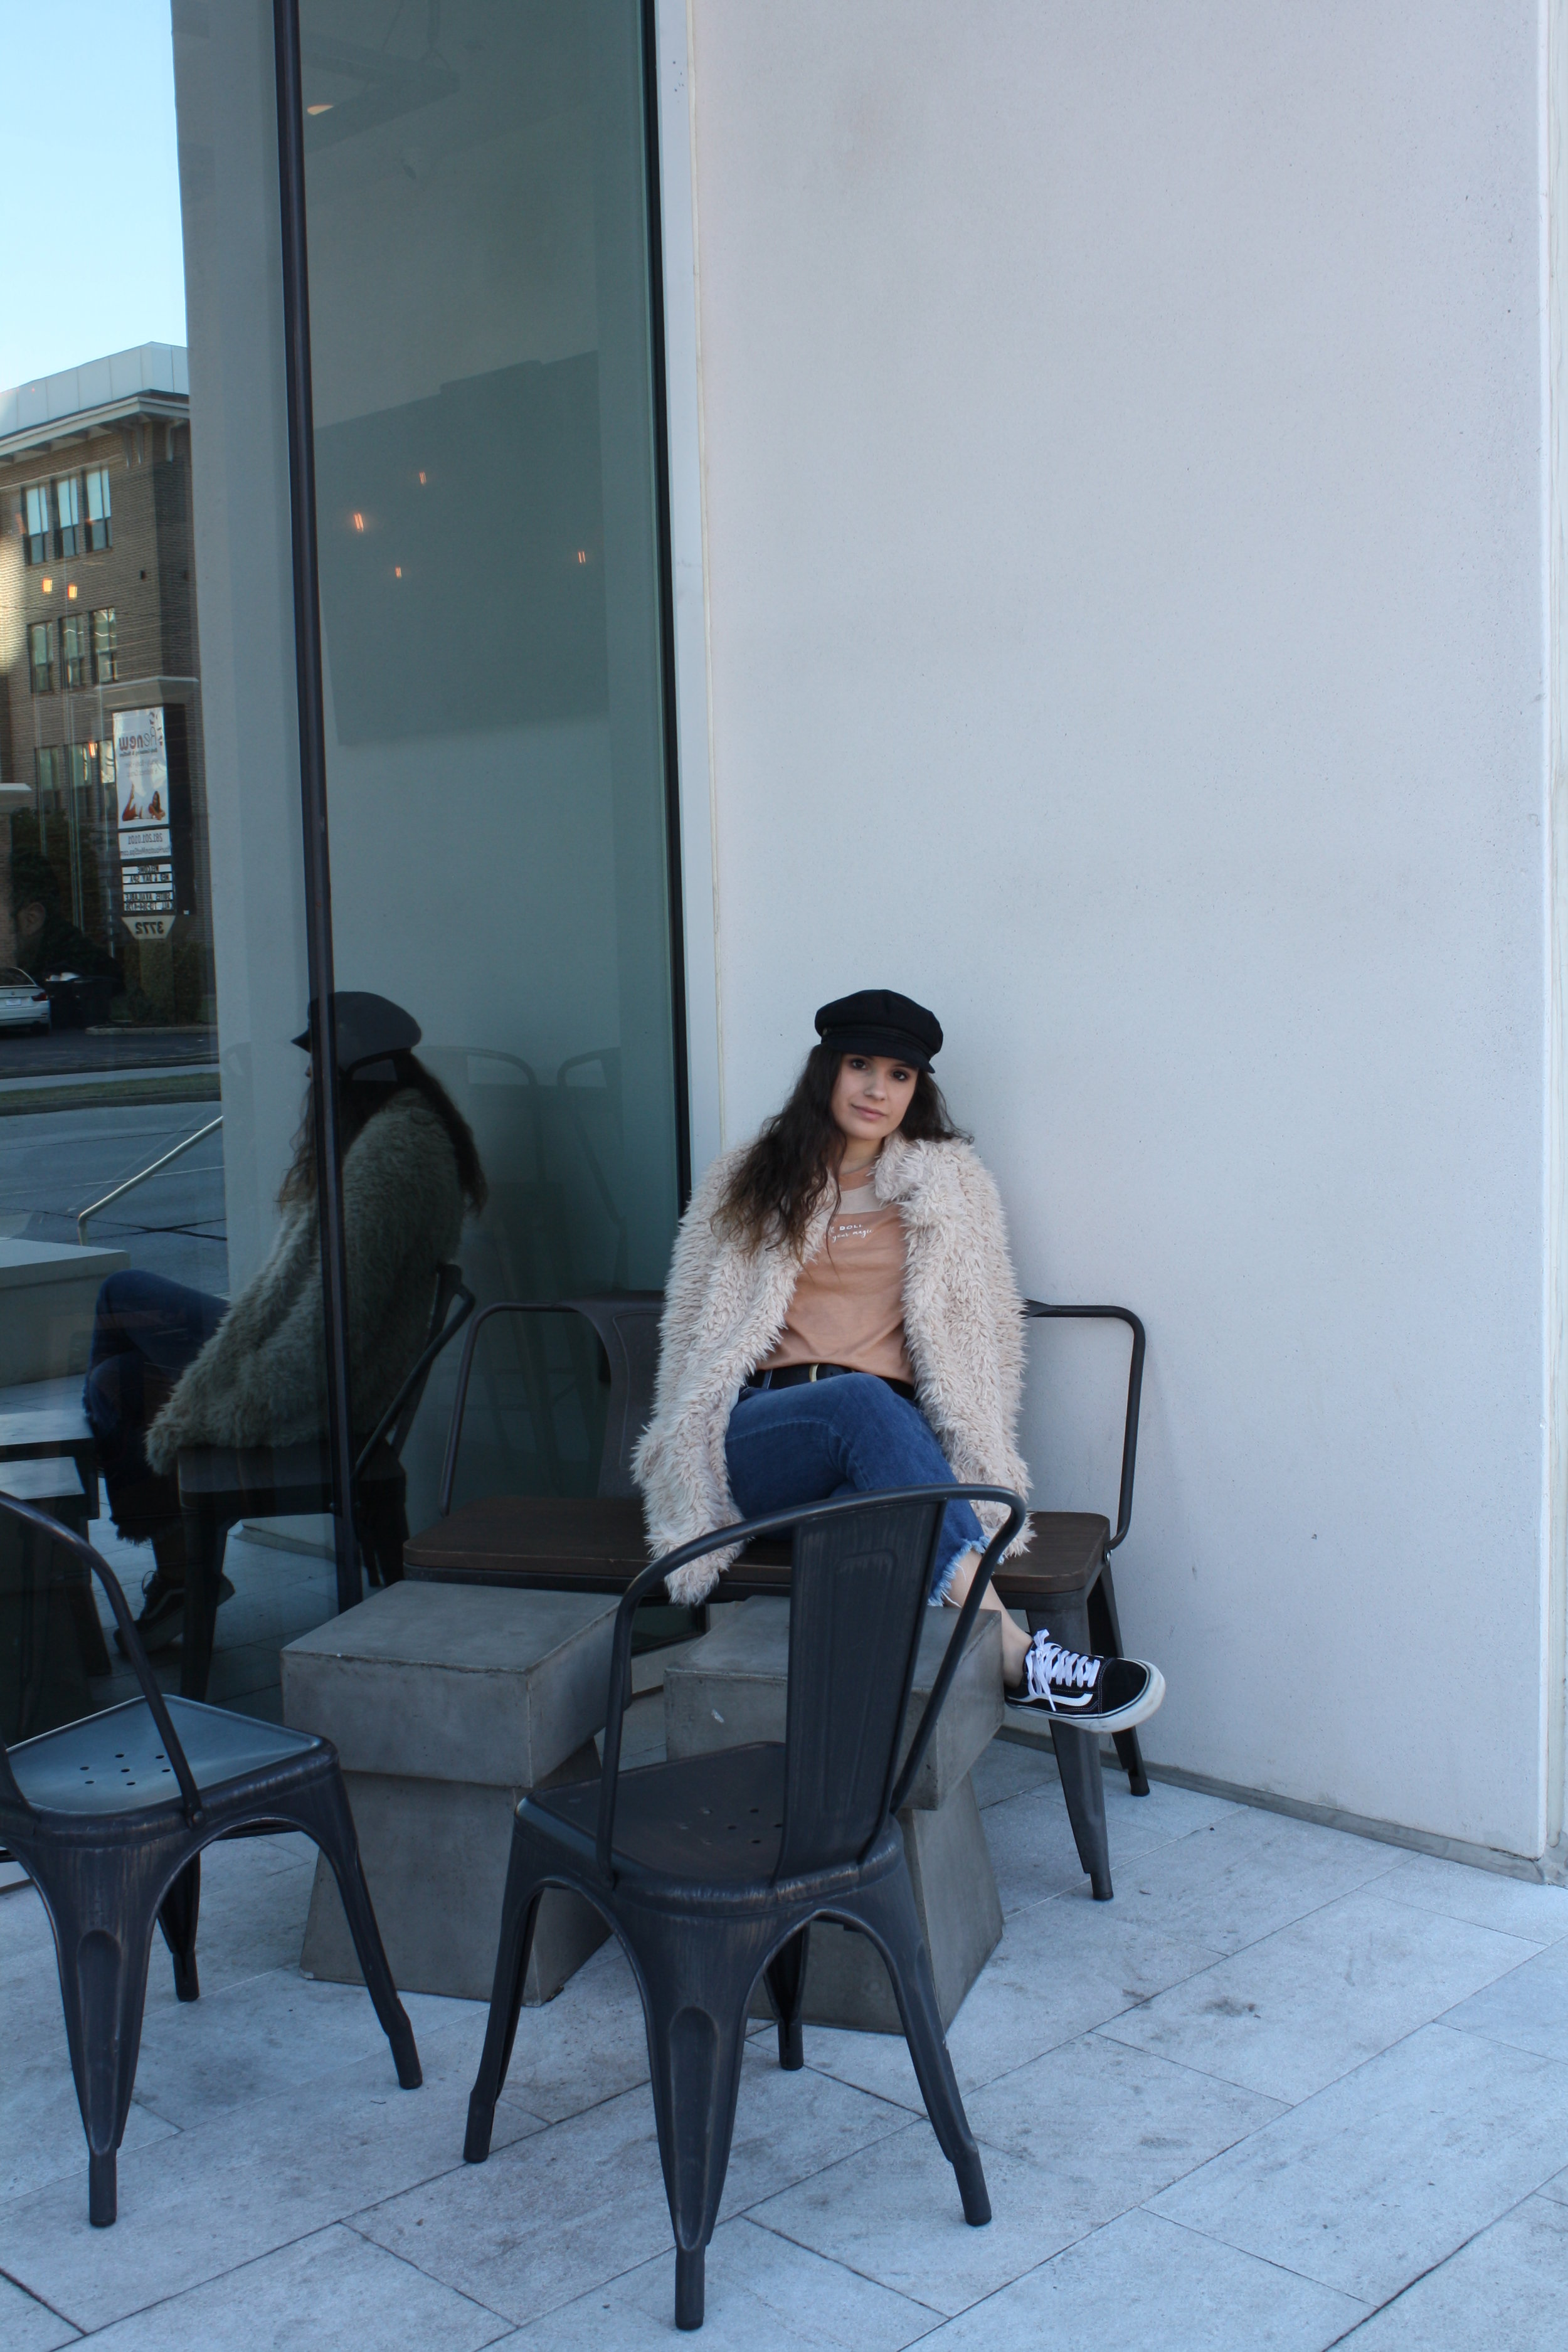 Hat: Brixton; Shirt: MATE the Label; Jacket: Sage the Label; Belt: B-Low The Belt; Jeans: Just Black Denim; Shoes: Vans